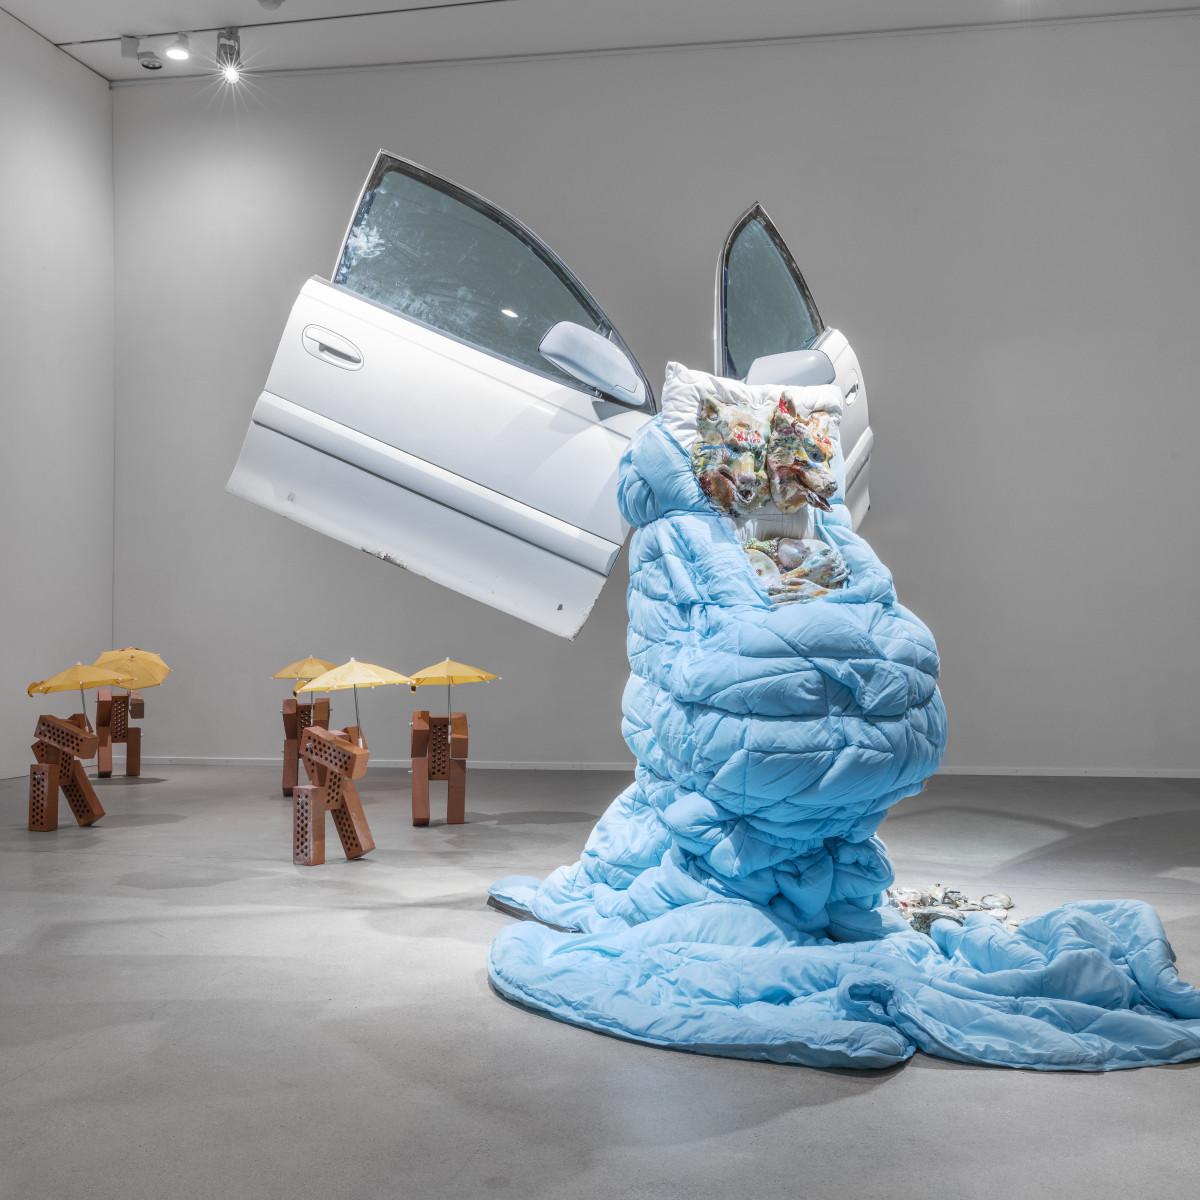 Marcelle Joseph Interviews Multidisciplinary Estonian Artist, Kris Lemsalu